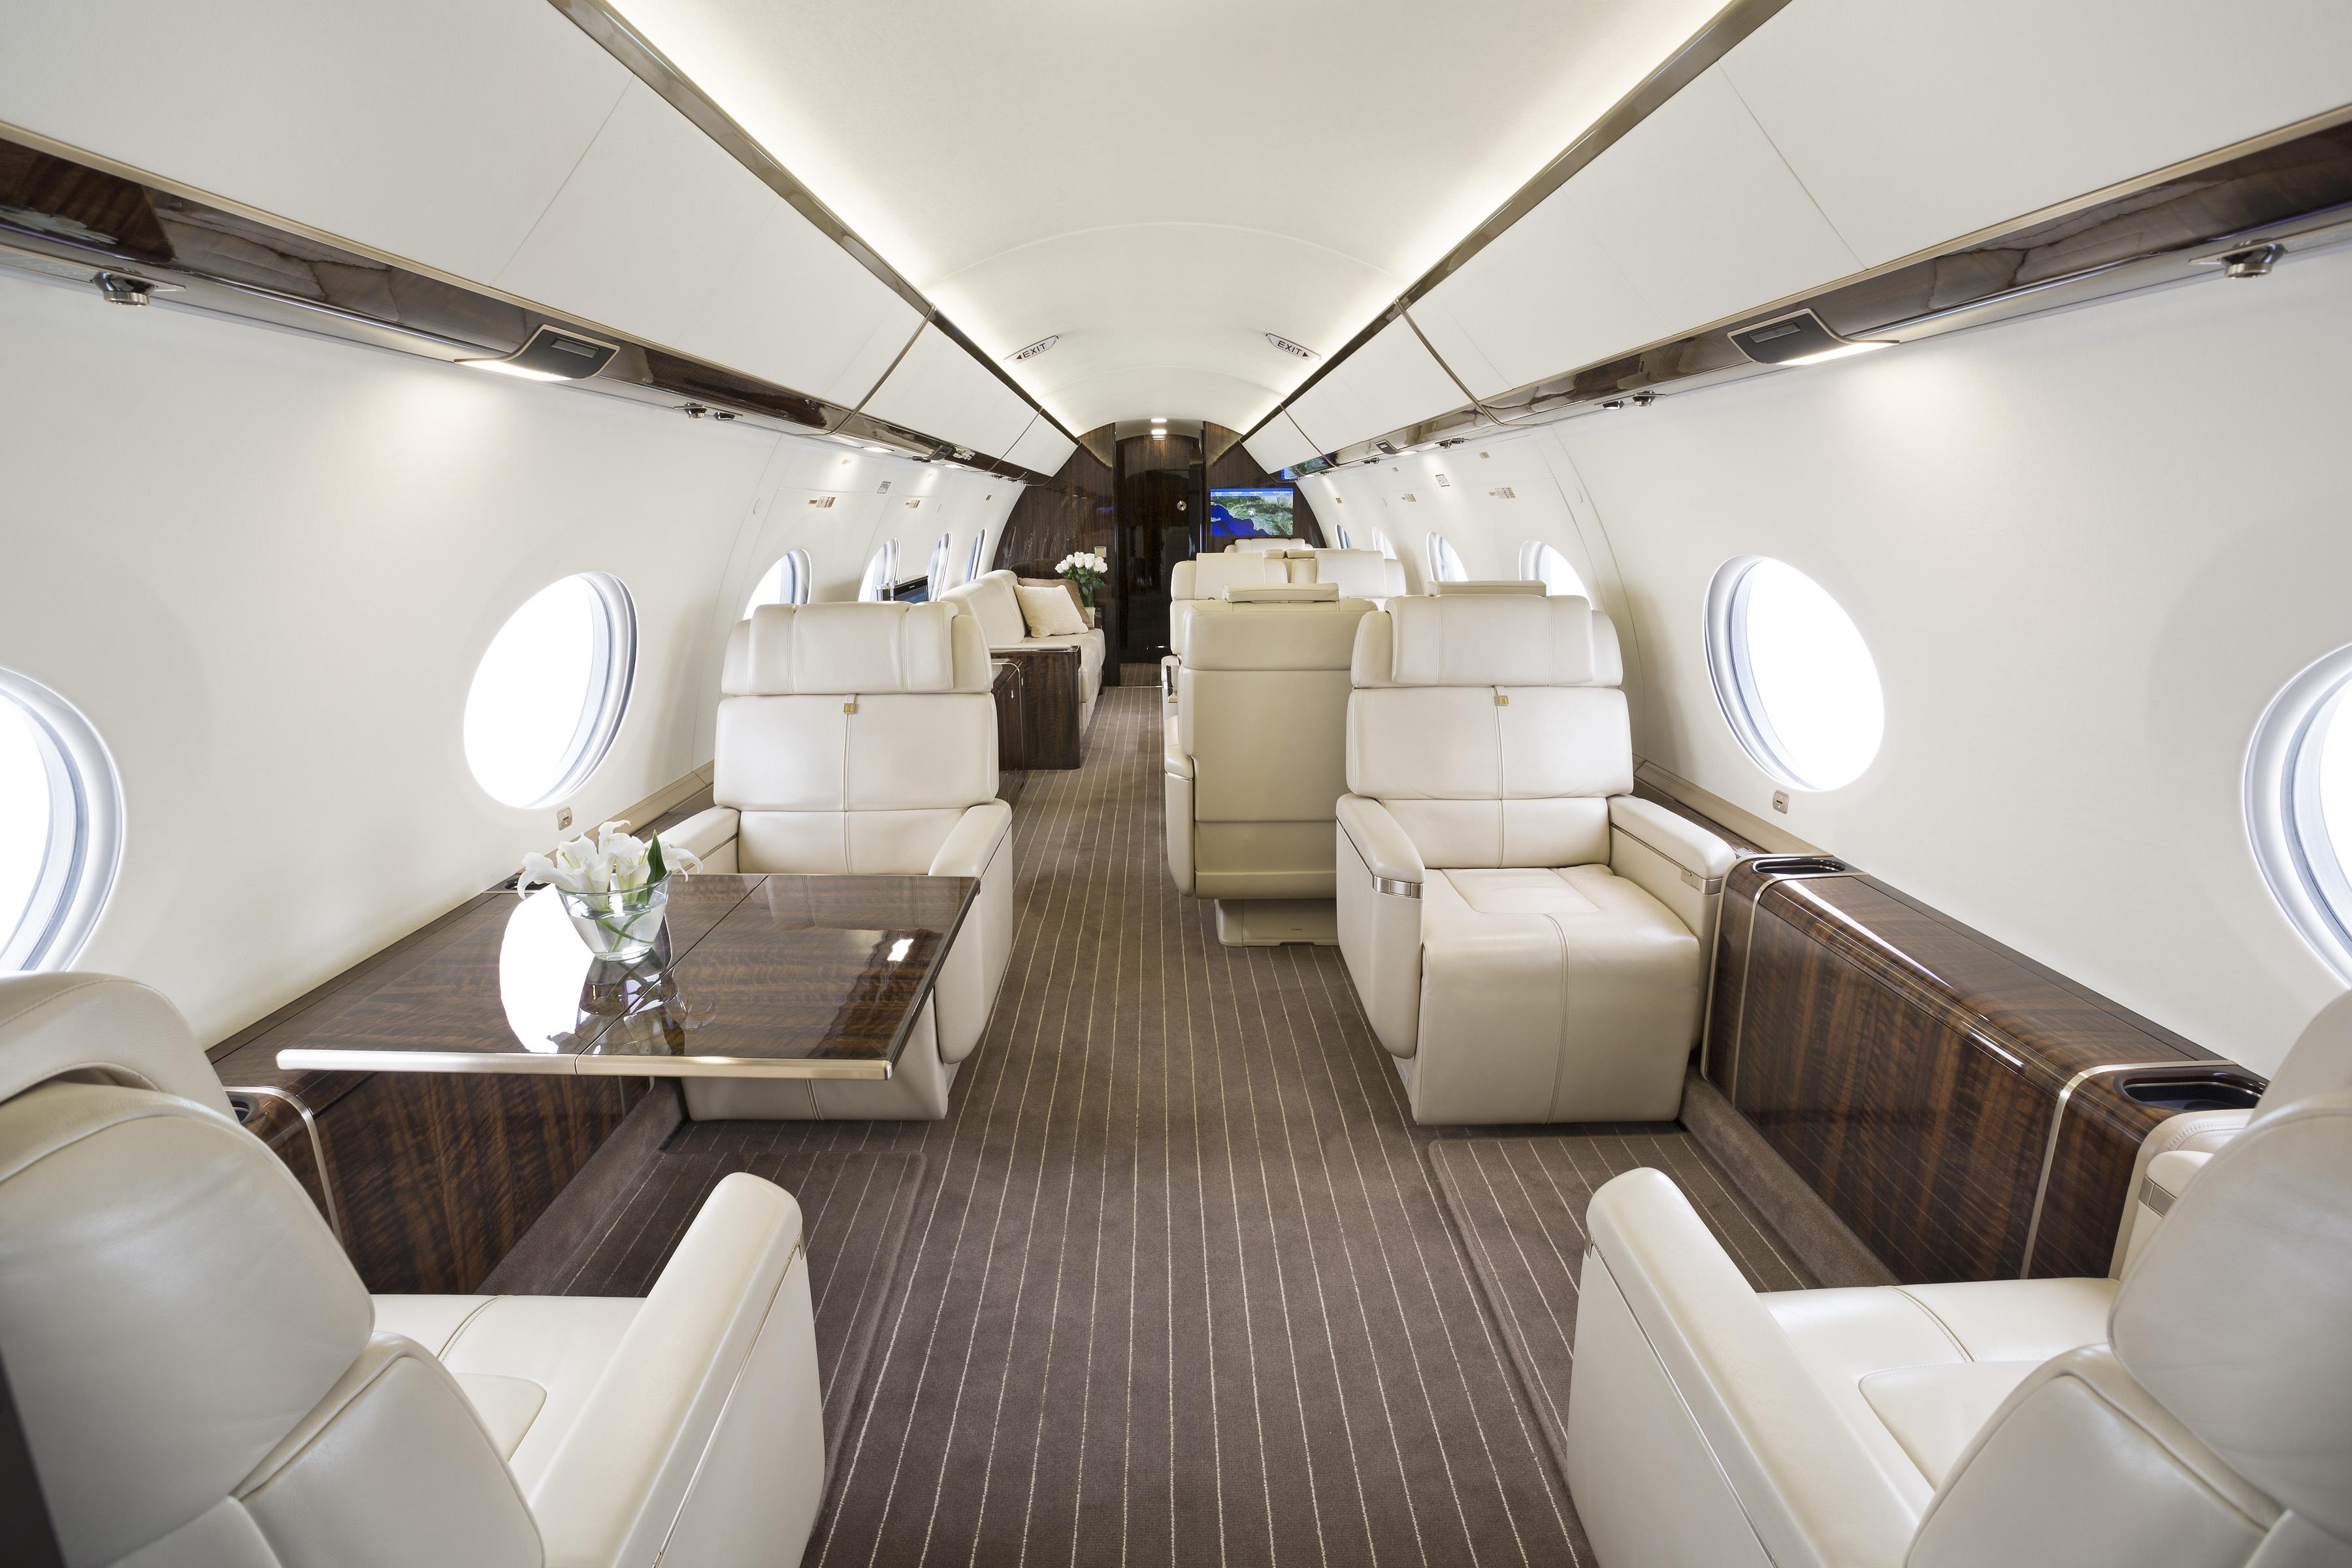 Jet Edge G650 aircraft's luxury interior. (Photo: Business Wire)